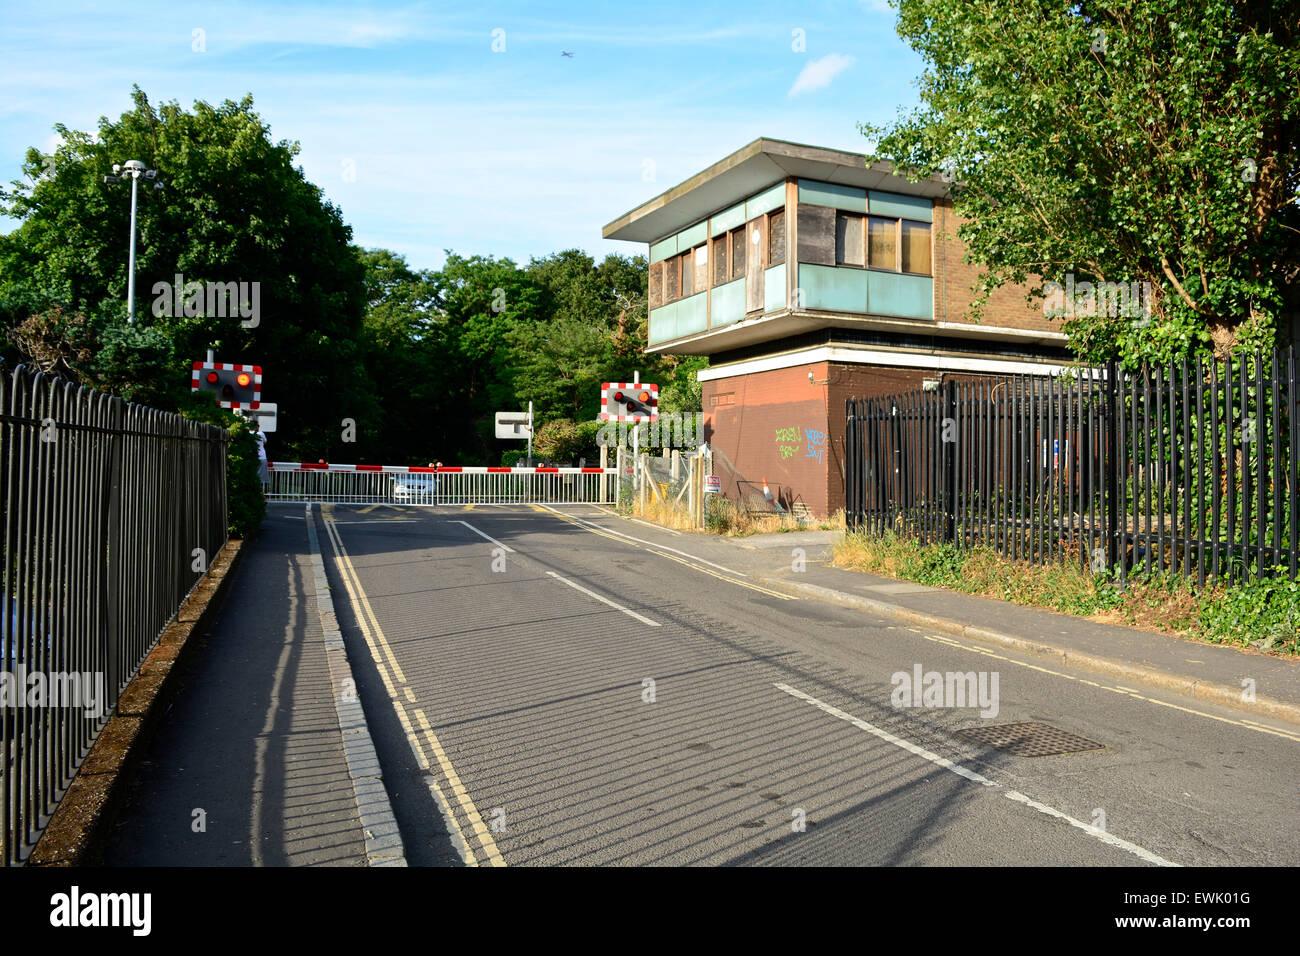 Rebe-Straße-Bahnübergänge, Barnes, London, SW13 Stockbild